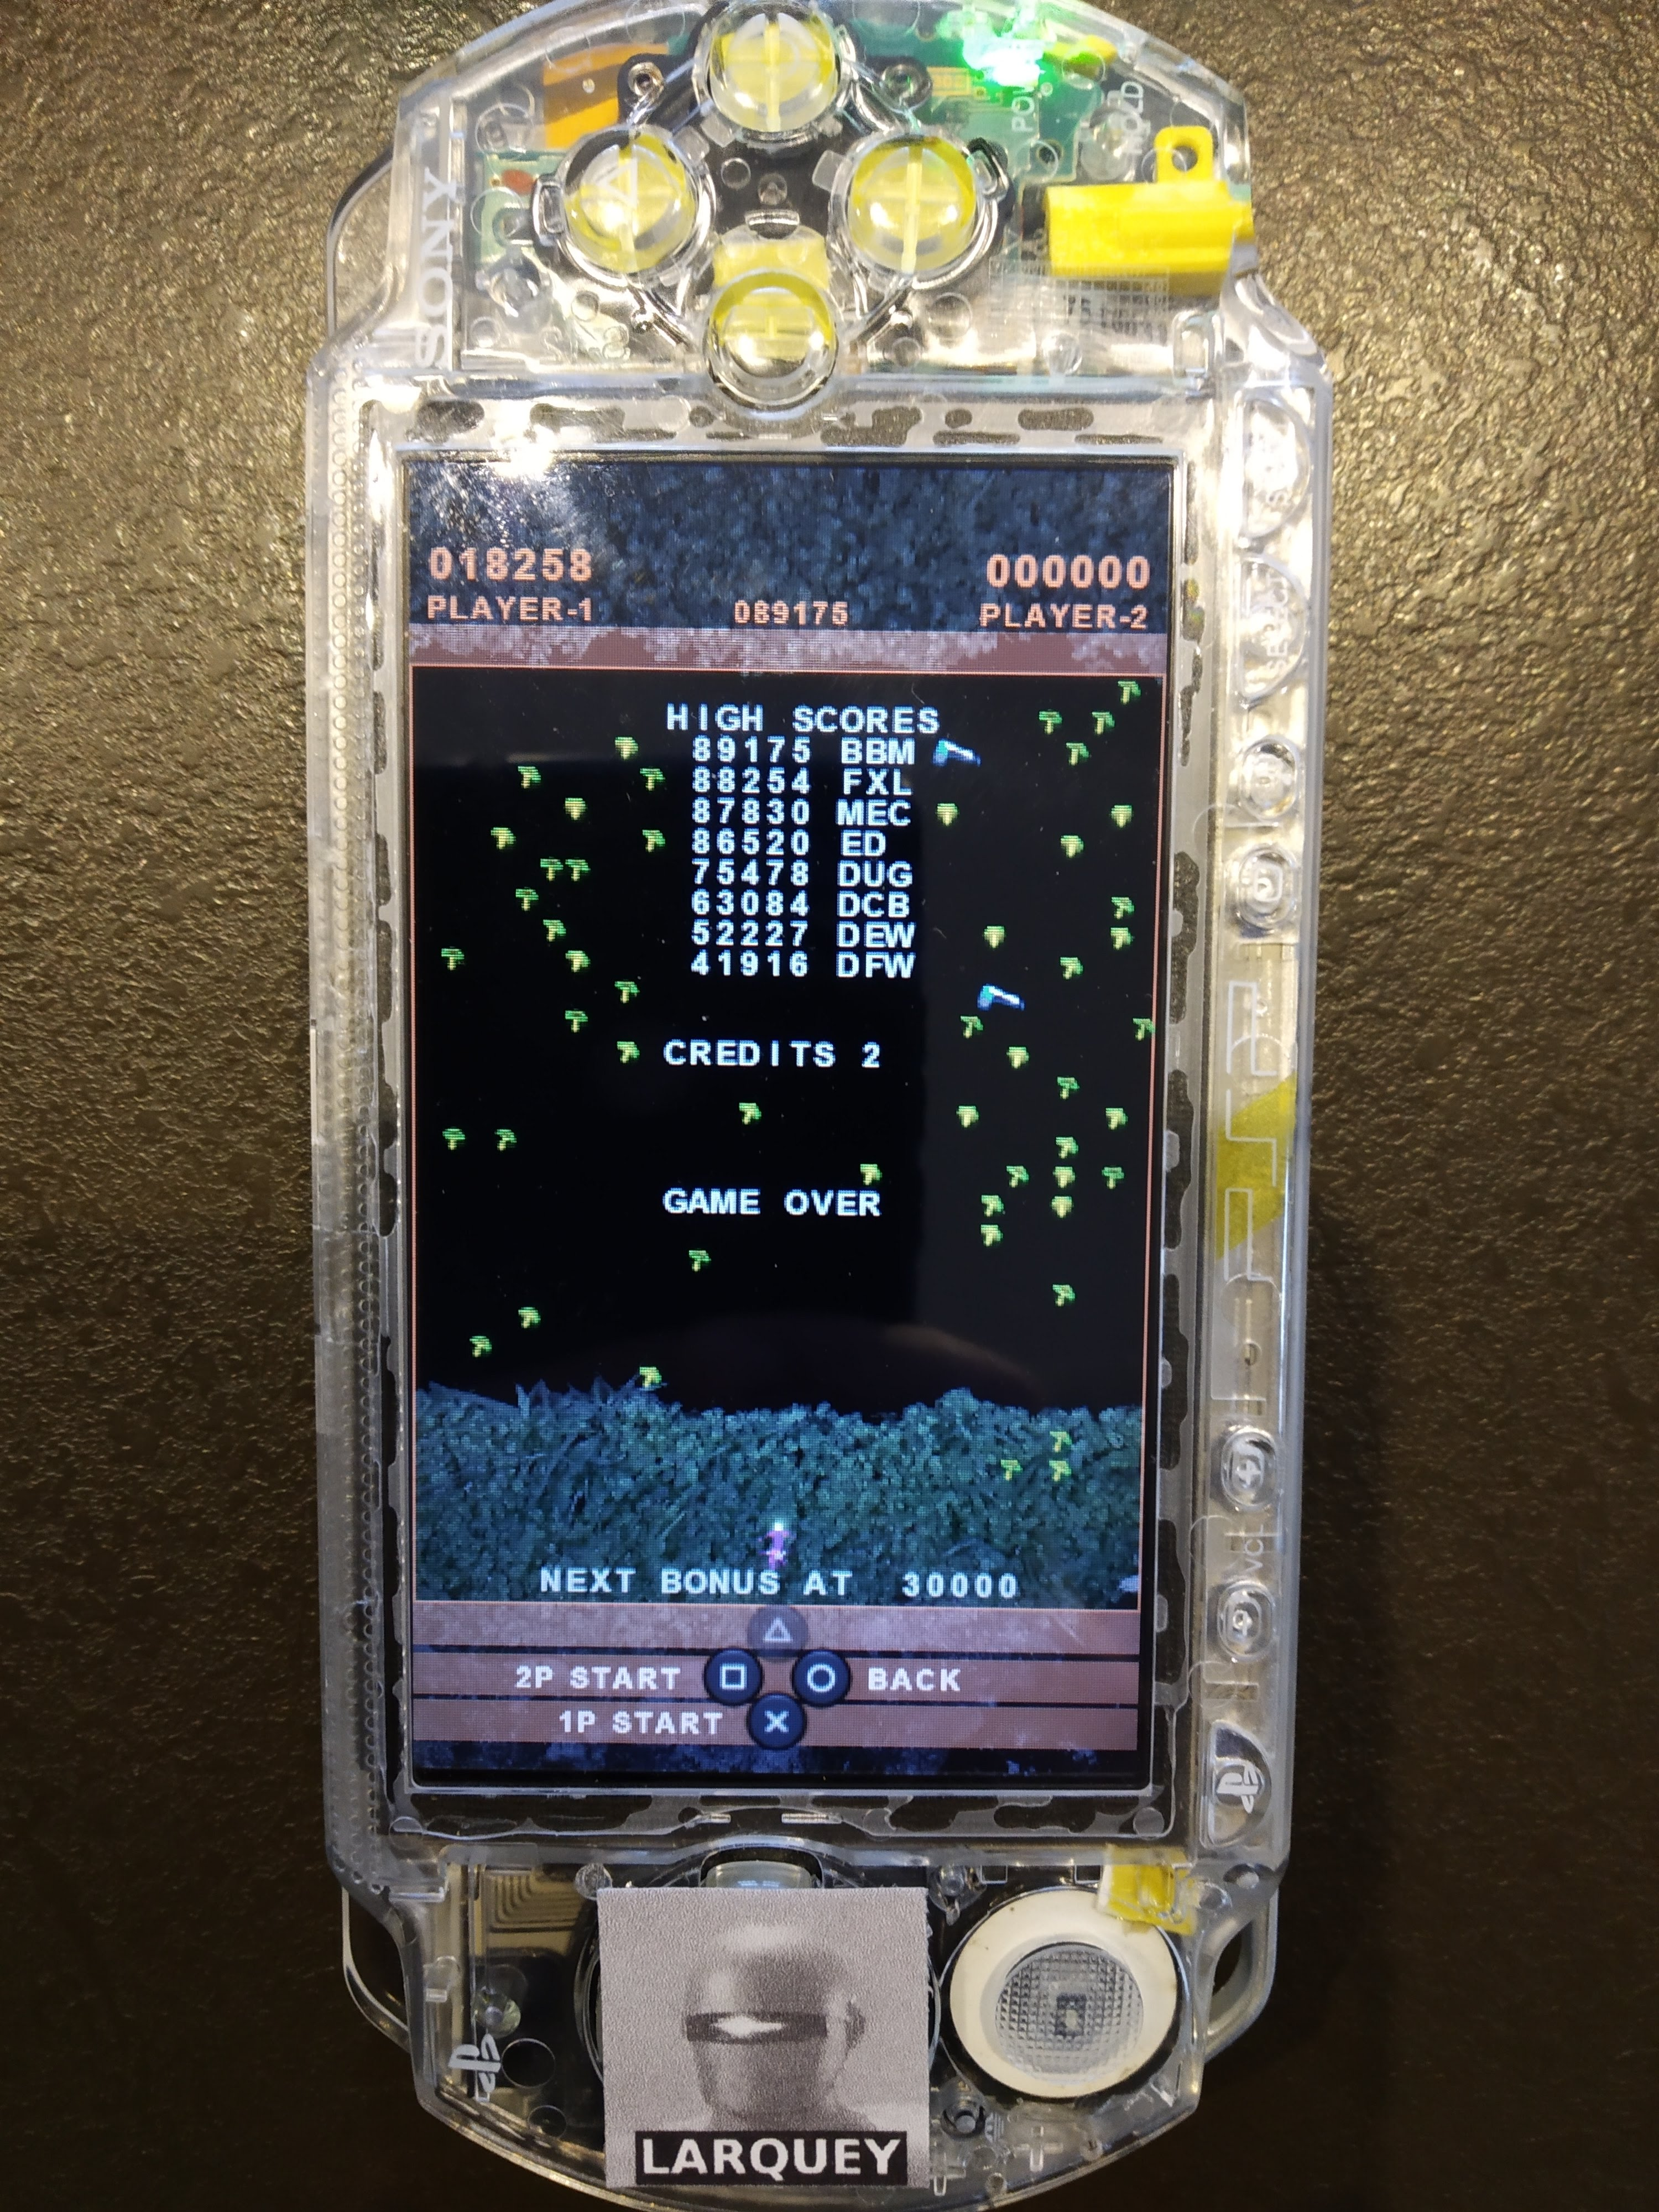 Larquey: Atari Classics Evolved: Millipede [Evolved] (PSP) 18,258 points on 2019-12-27 02:46:20